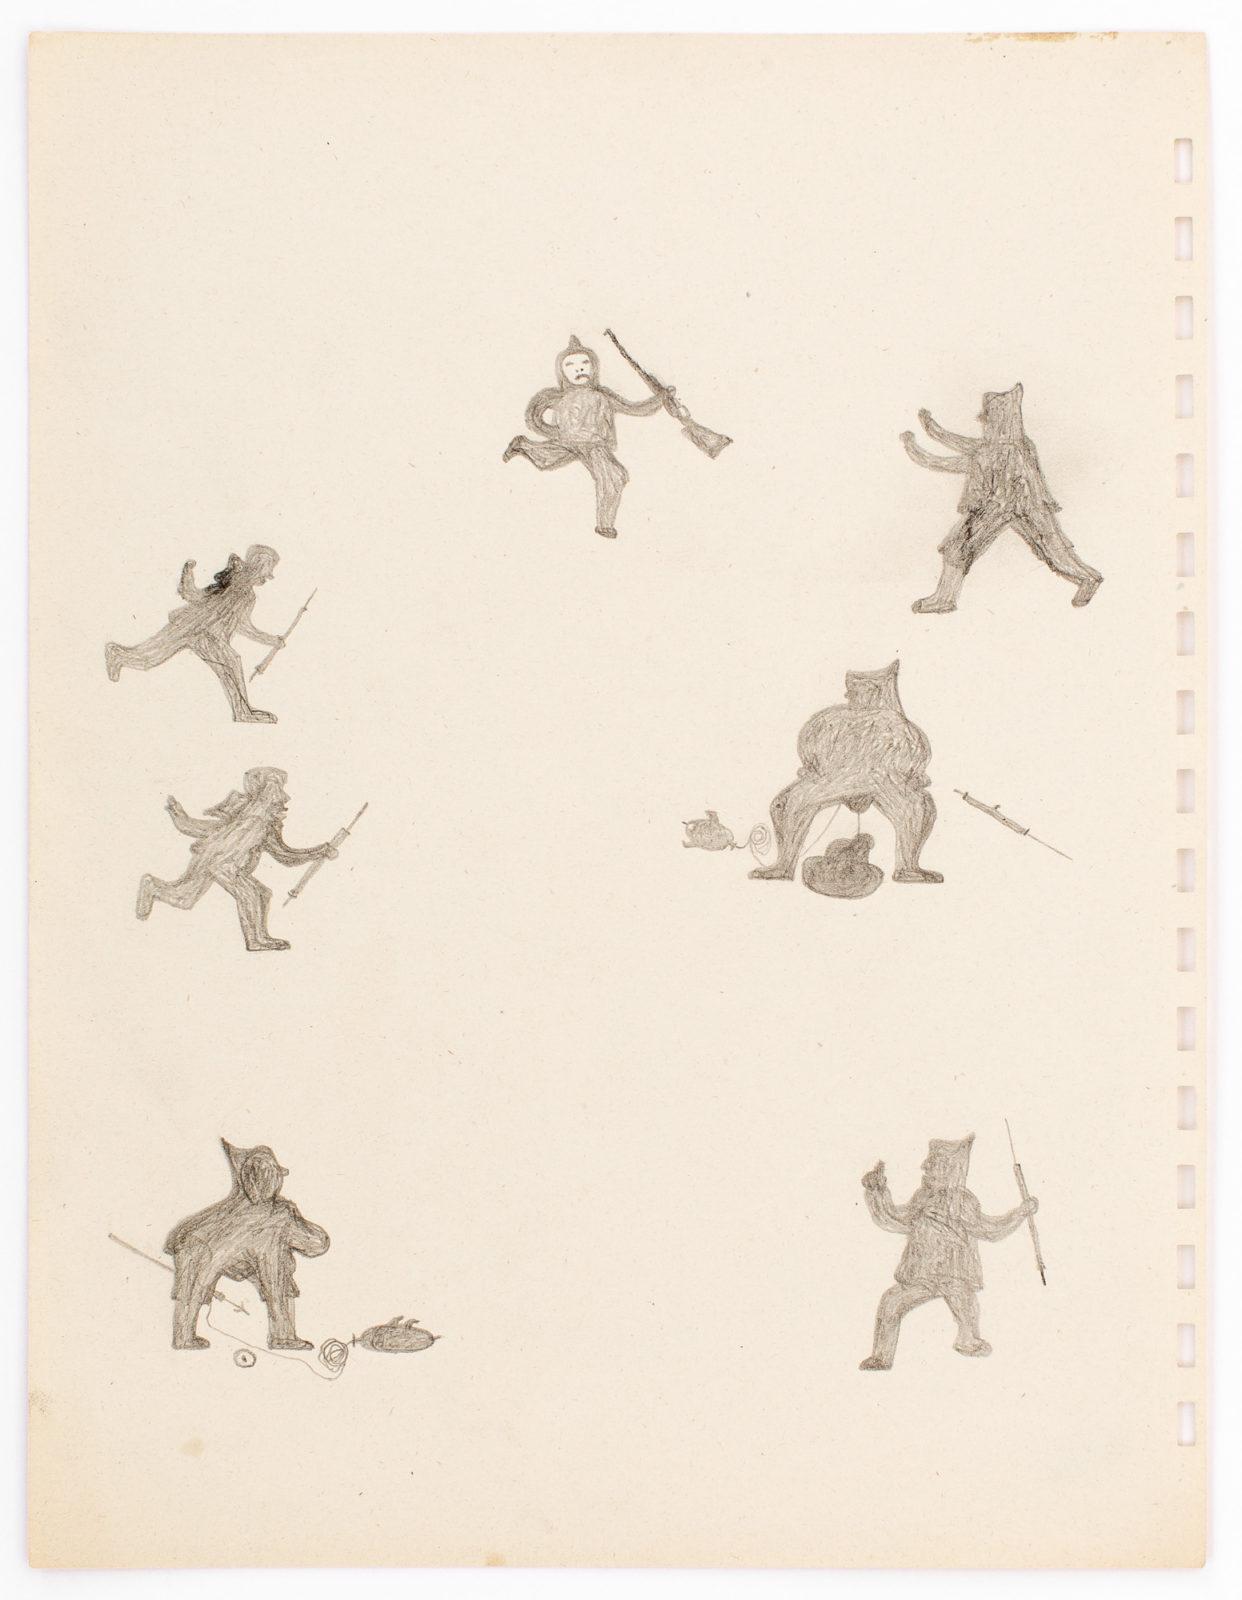 Niviaqsi - untitled (group of hunters)